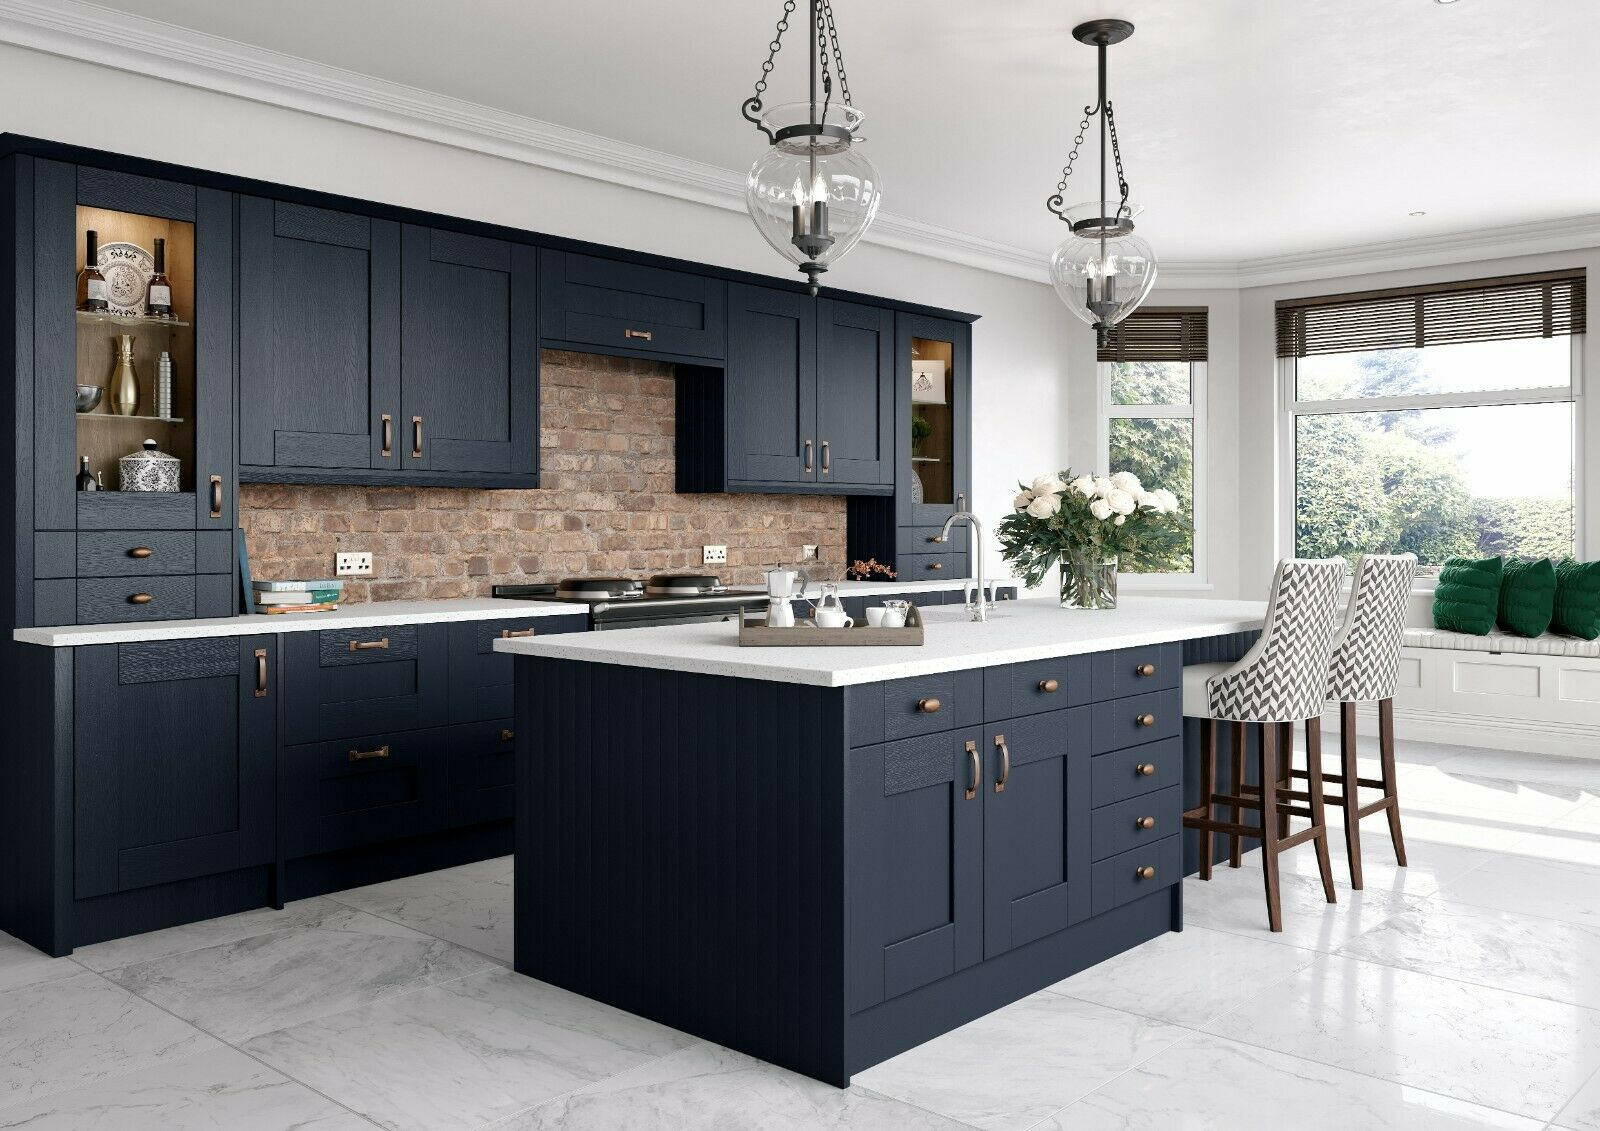 New Navy Blue Shaker Replacement Kitchen Doors Not White Light Grey Graphite Ebay